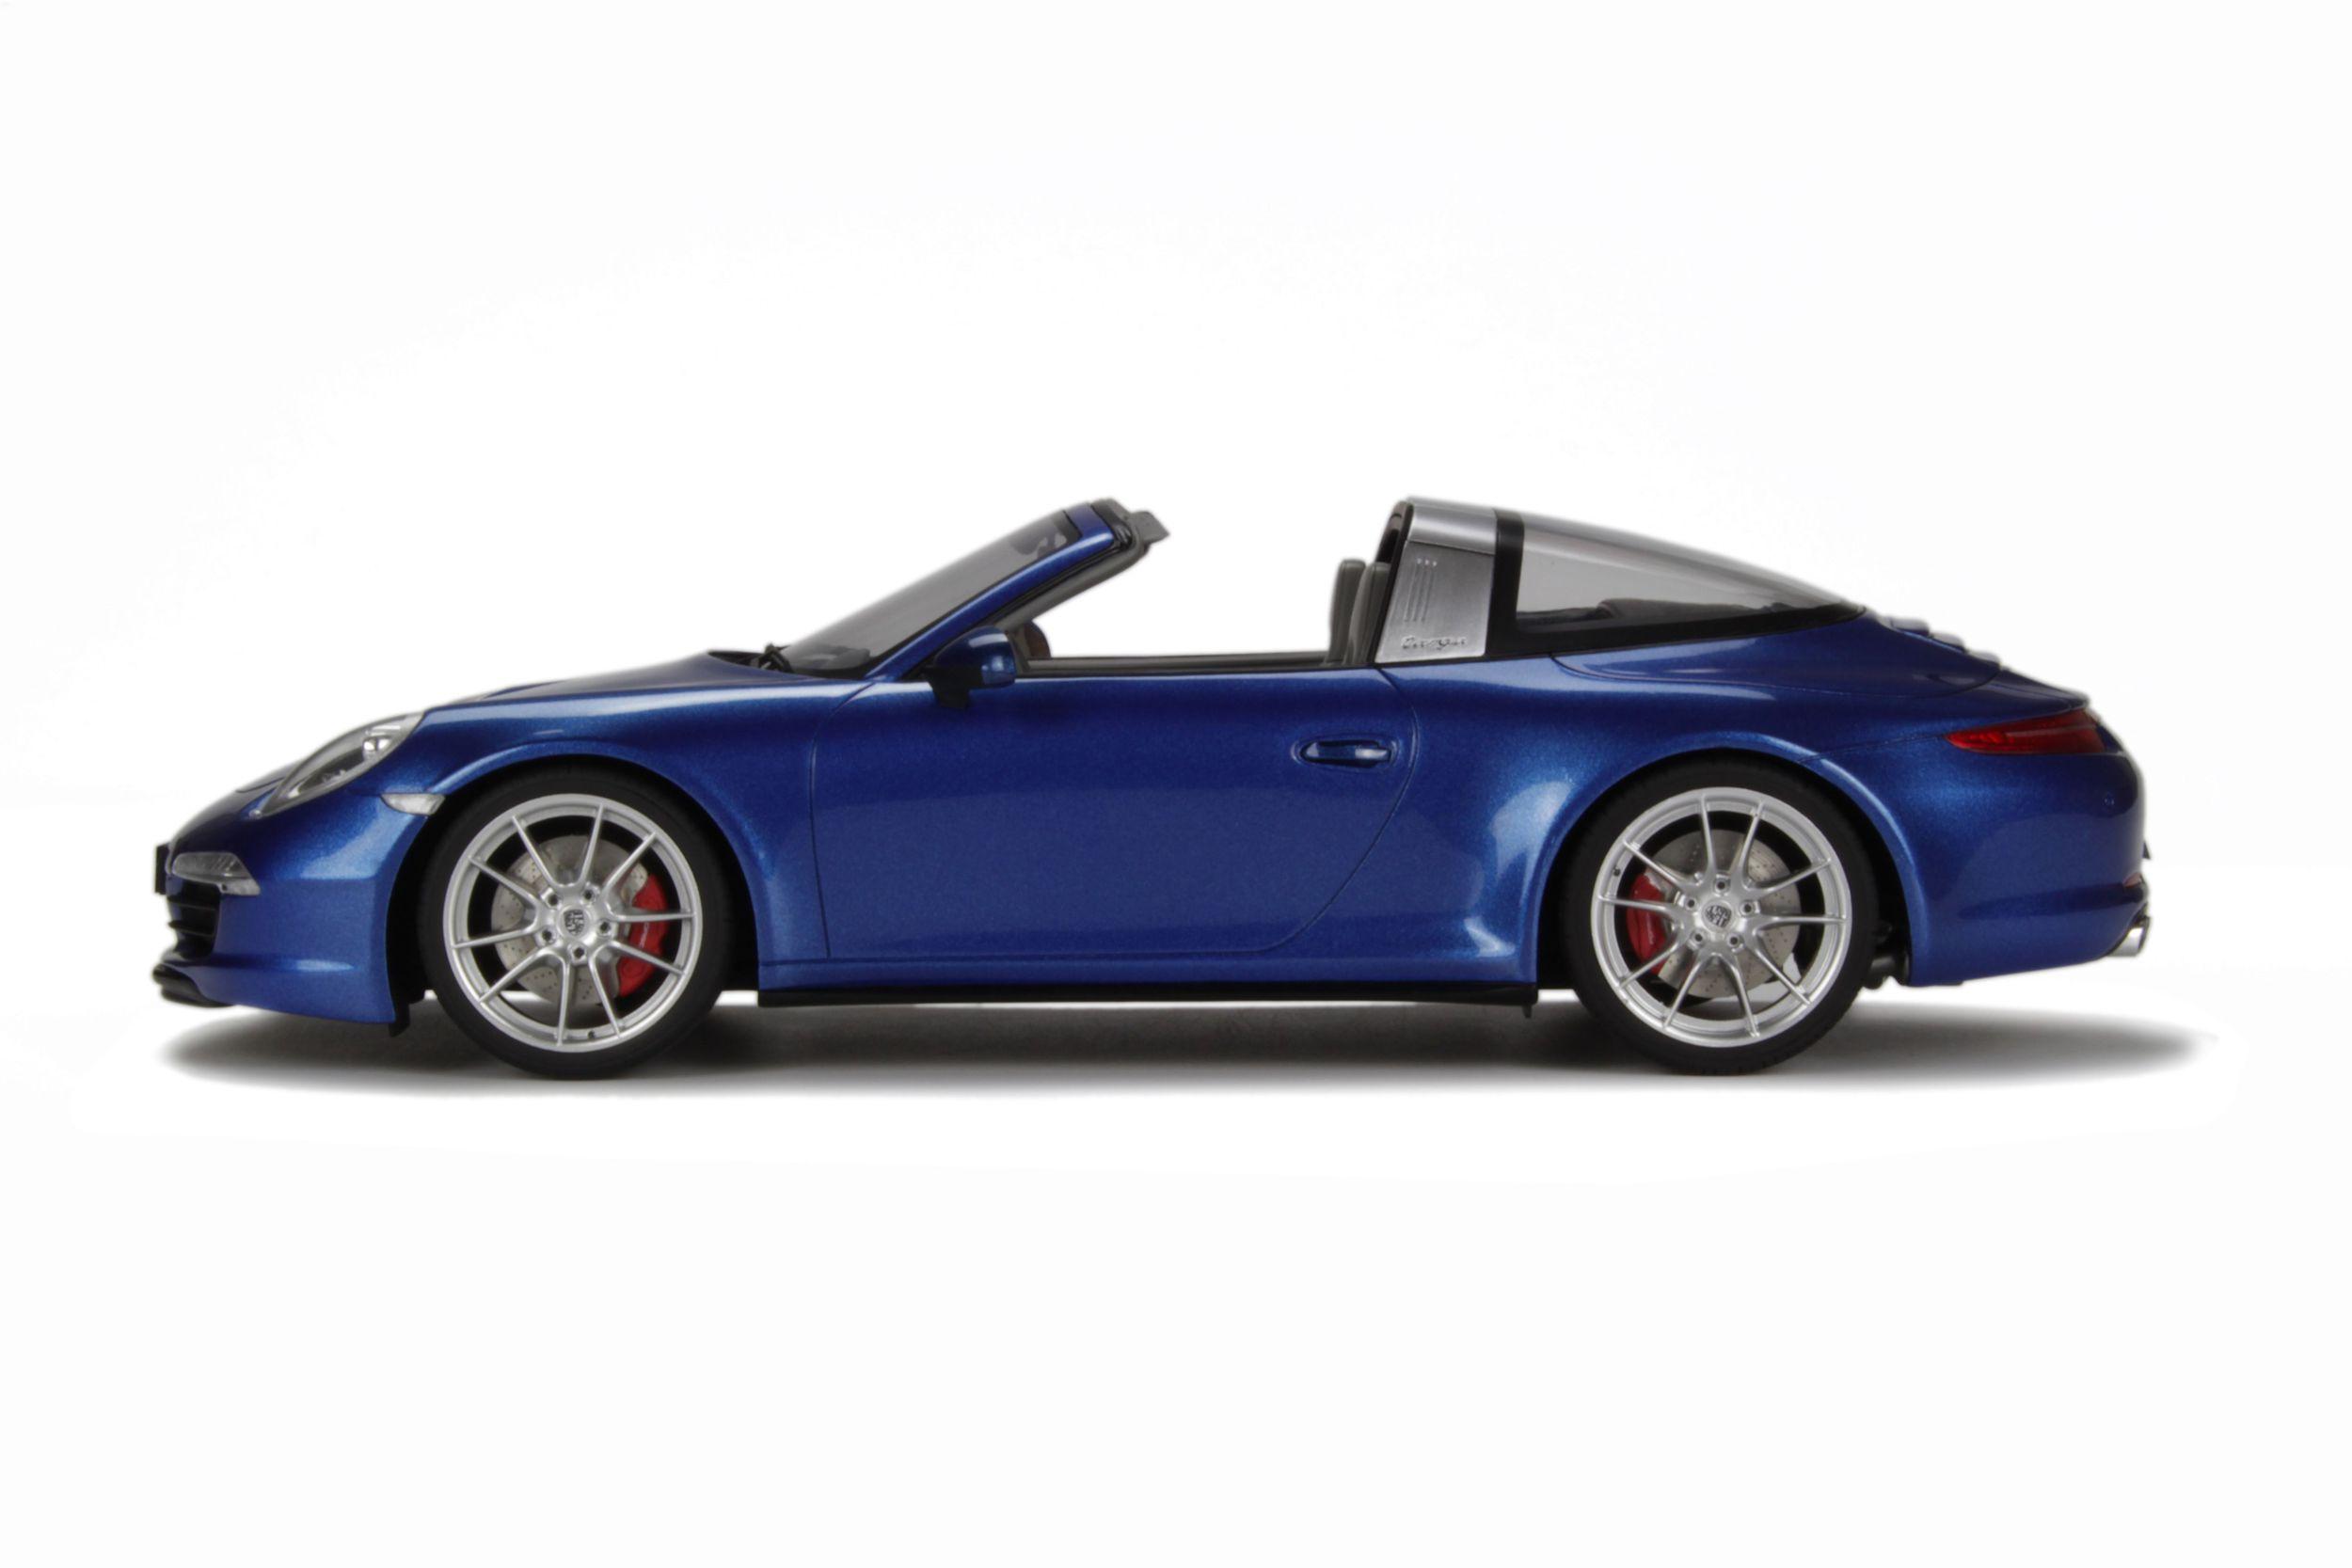 Porsche Targa 4S >> Porsche 911 (991) Targa 4S - Voiture miniature de ...